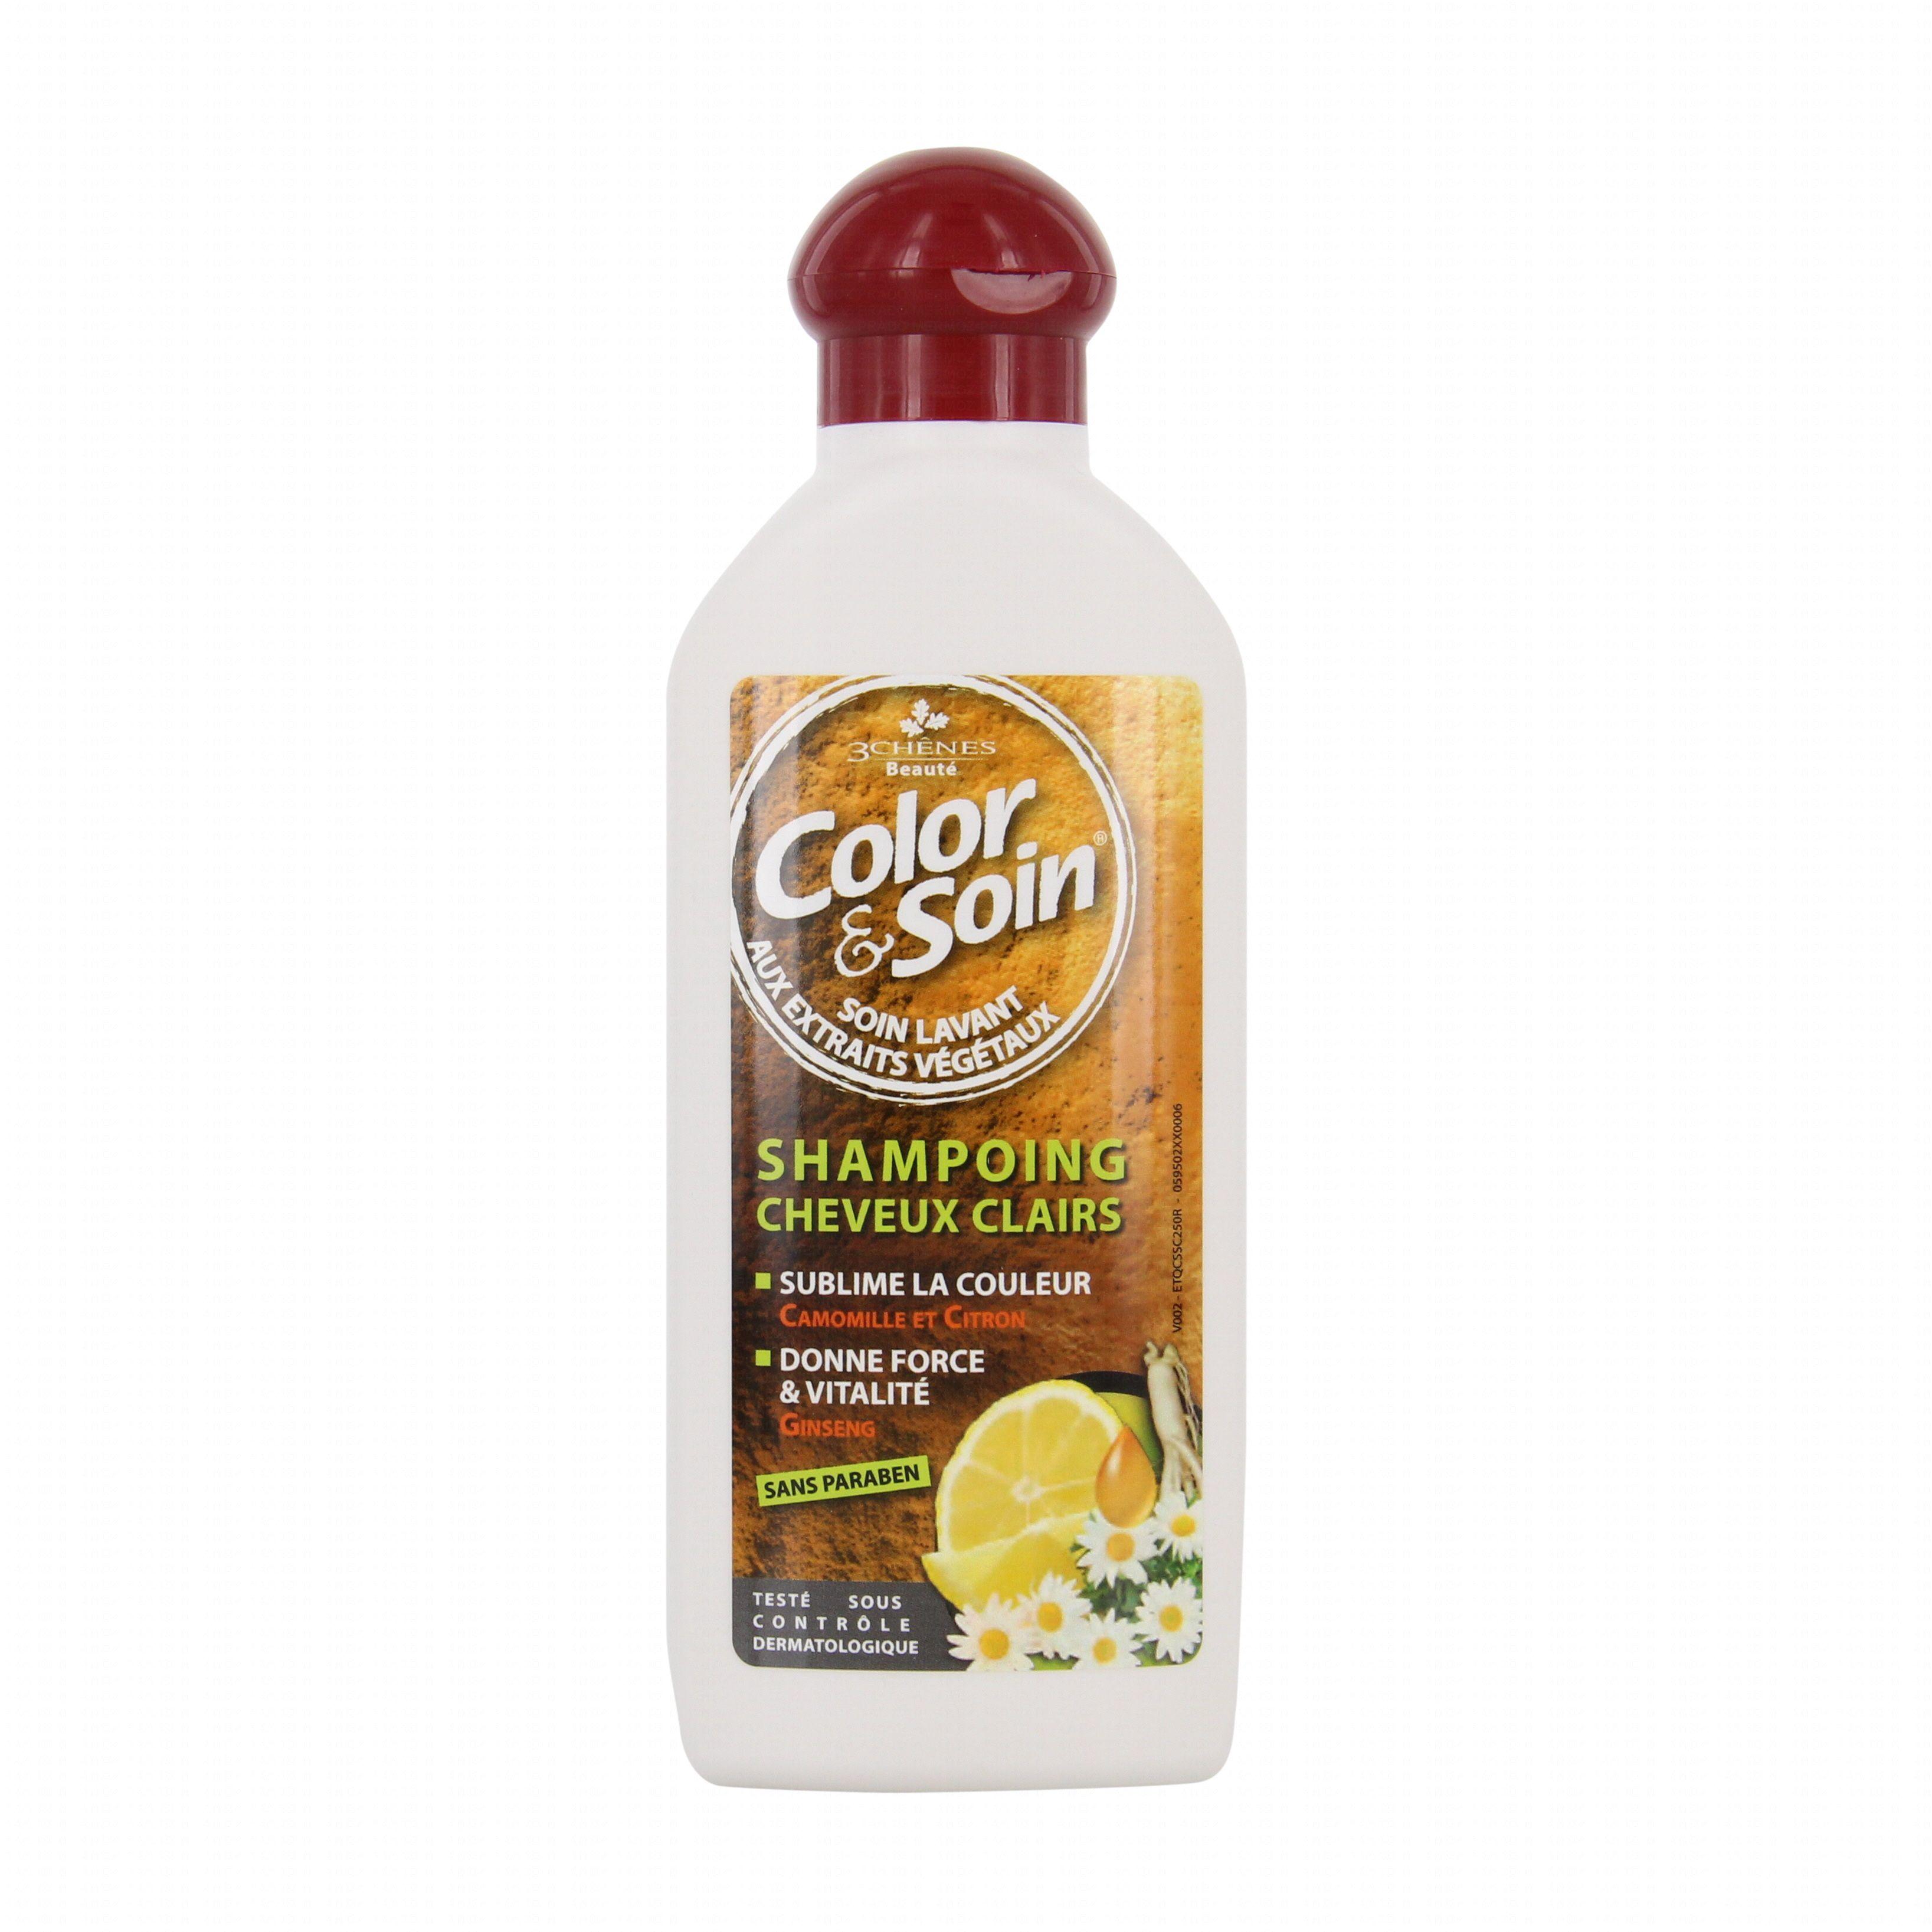 3 chnes color et soin shampooing cheveux clair flacon 250ml - Les 3 Chenes Coloration